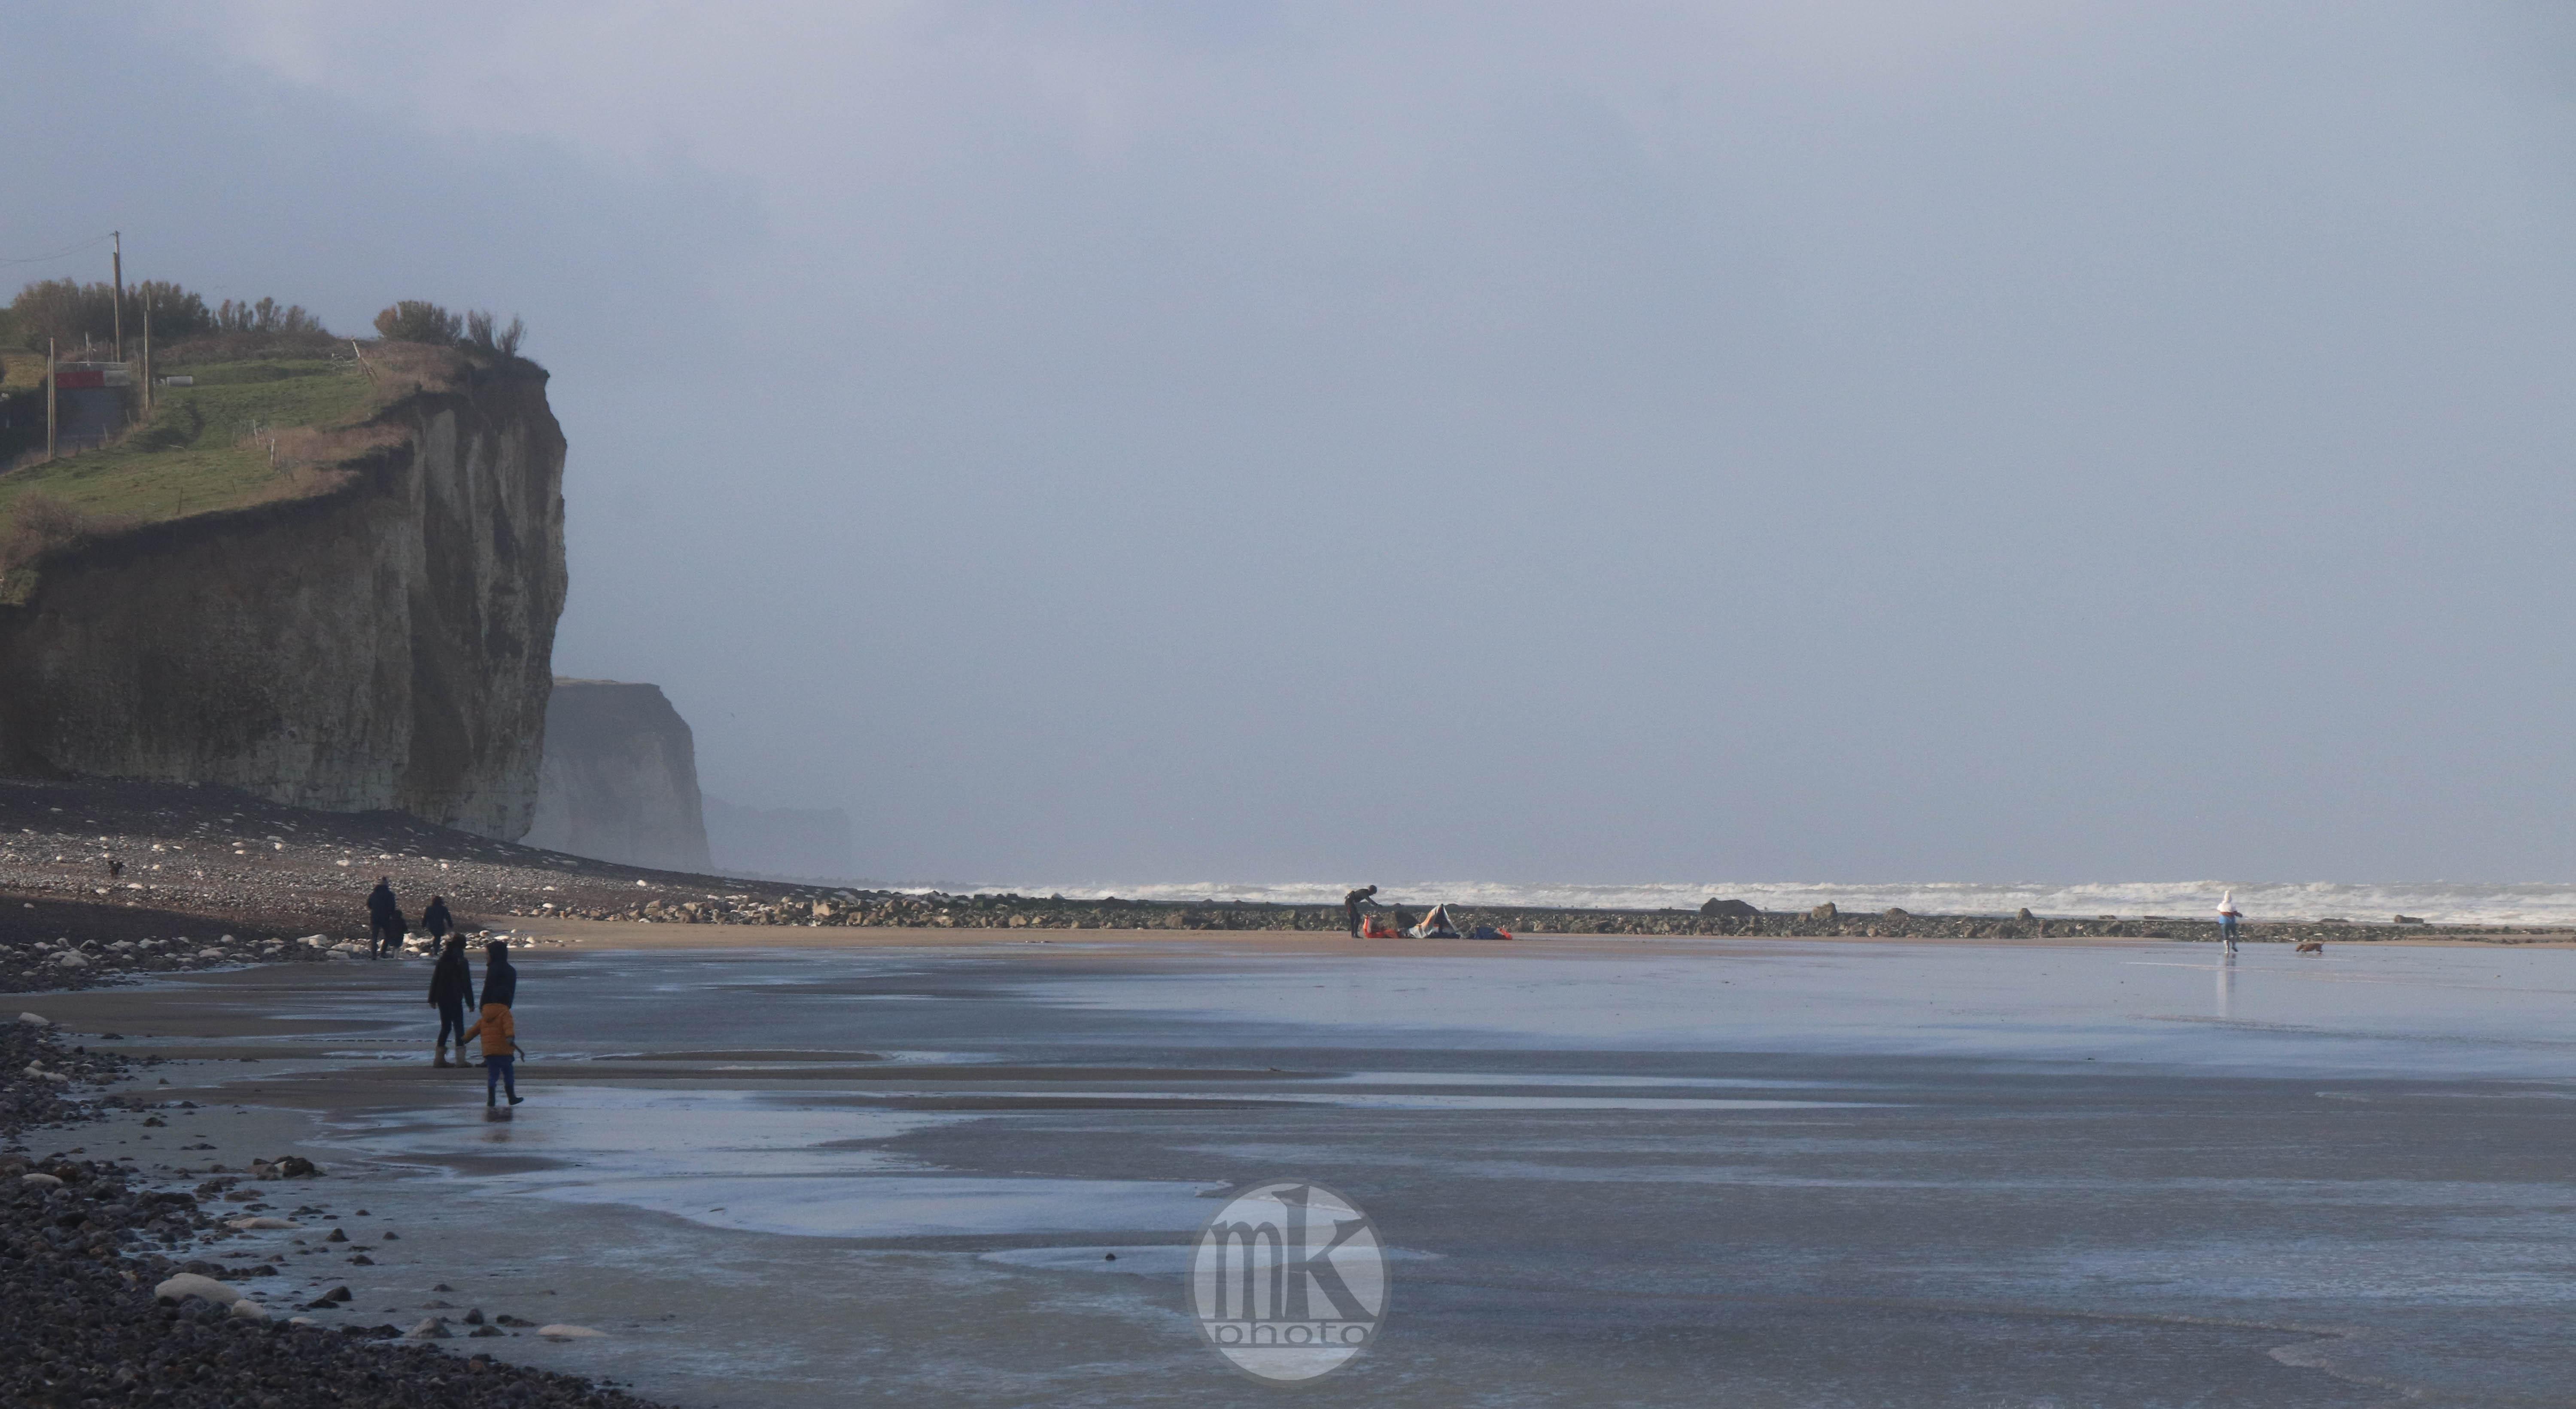 St Aubin s mer, 23 déc.19, 13h14.jpg